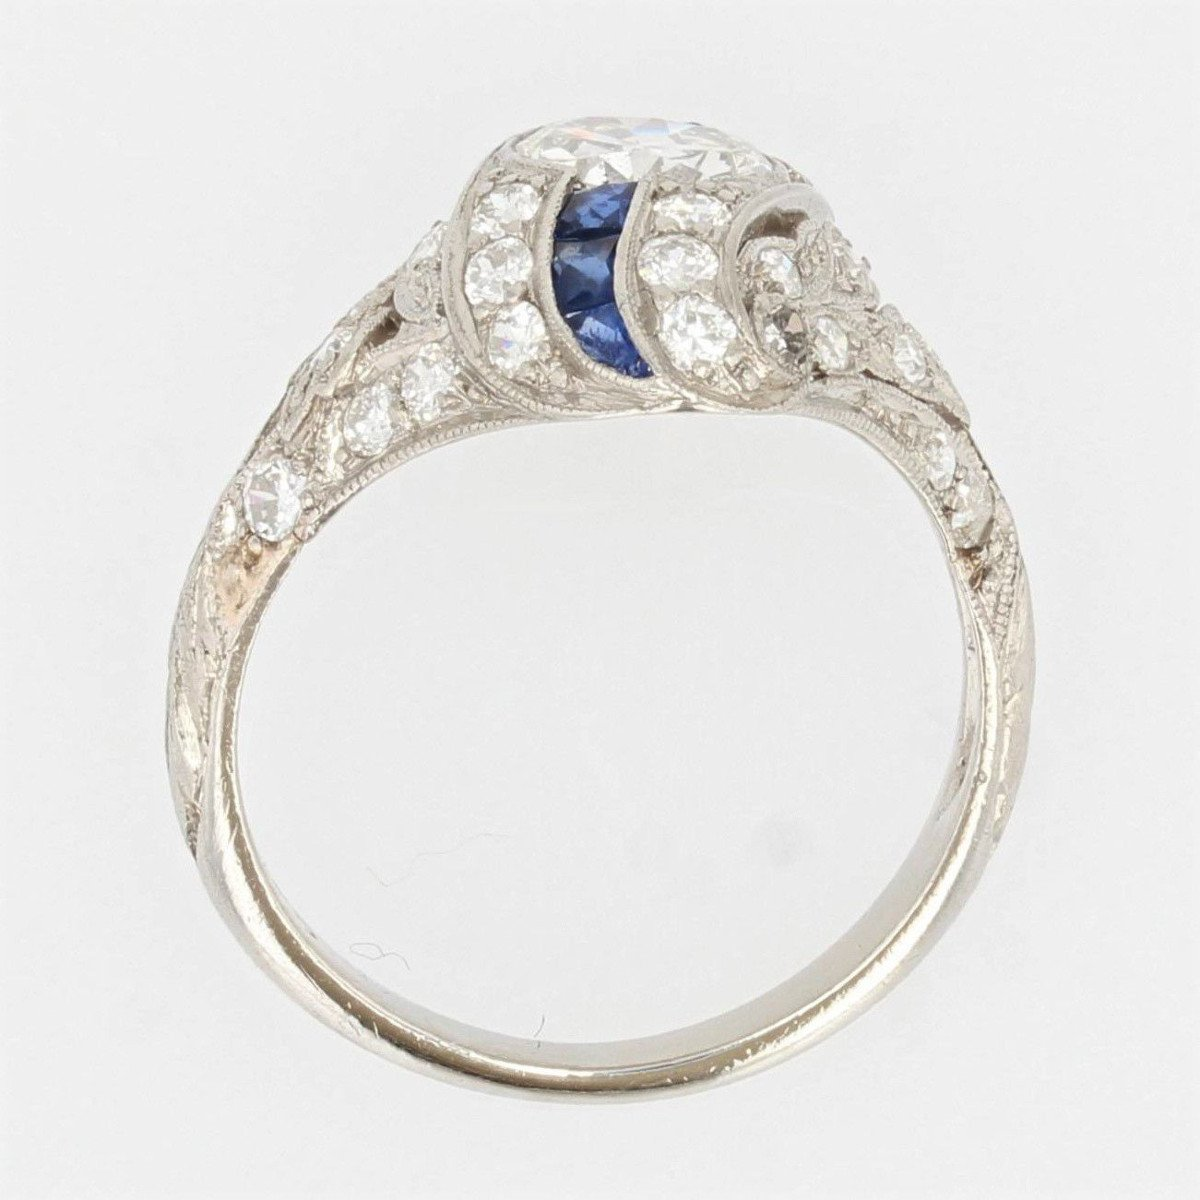 Art Deco Diamonds Calibrated Sapphires Ring-photo-6